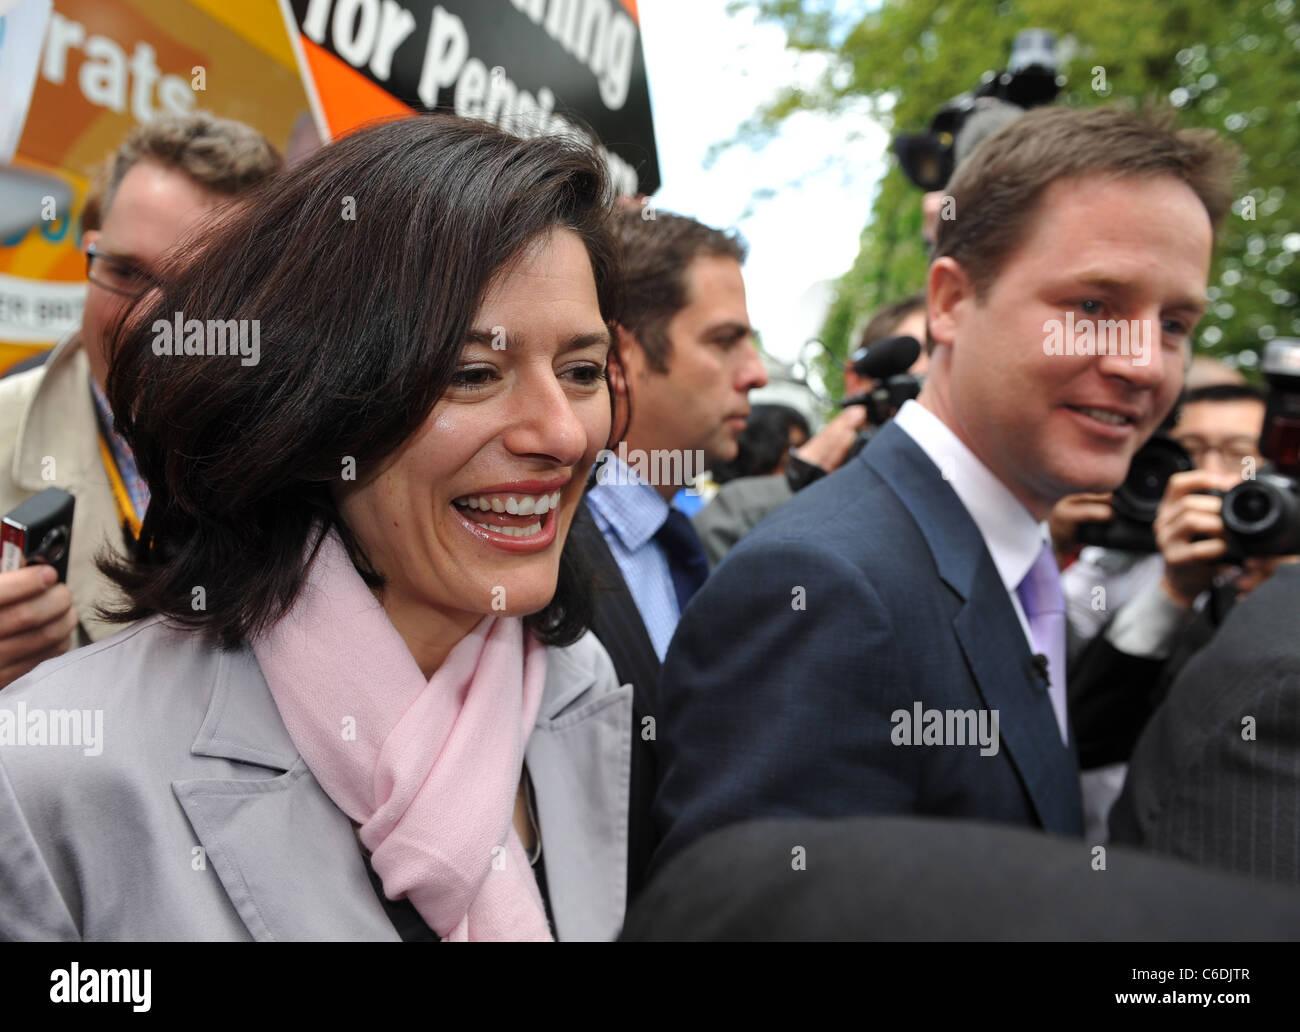 picture Why Miriam Gonzalez Durantez, Nick Clegg's Wife, Is Accusing British Airways Of Sexism